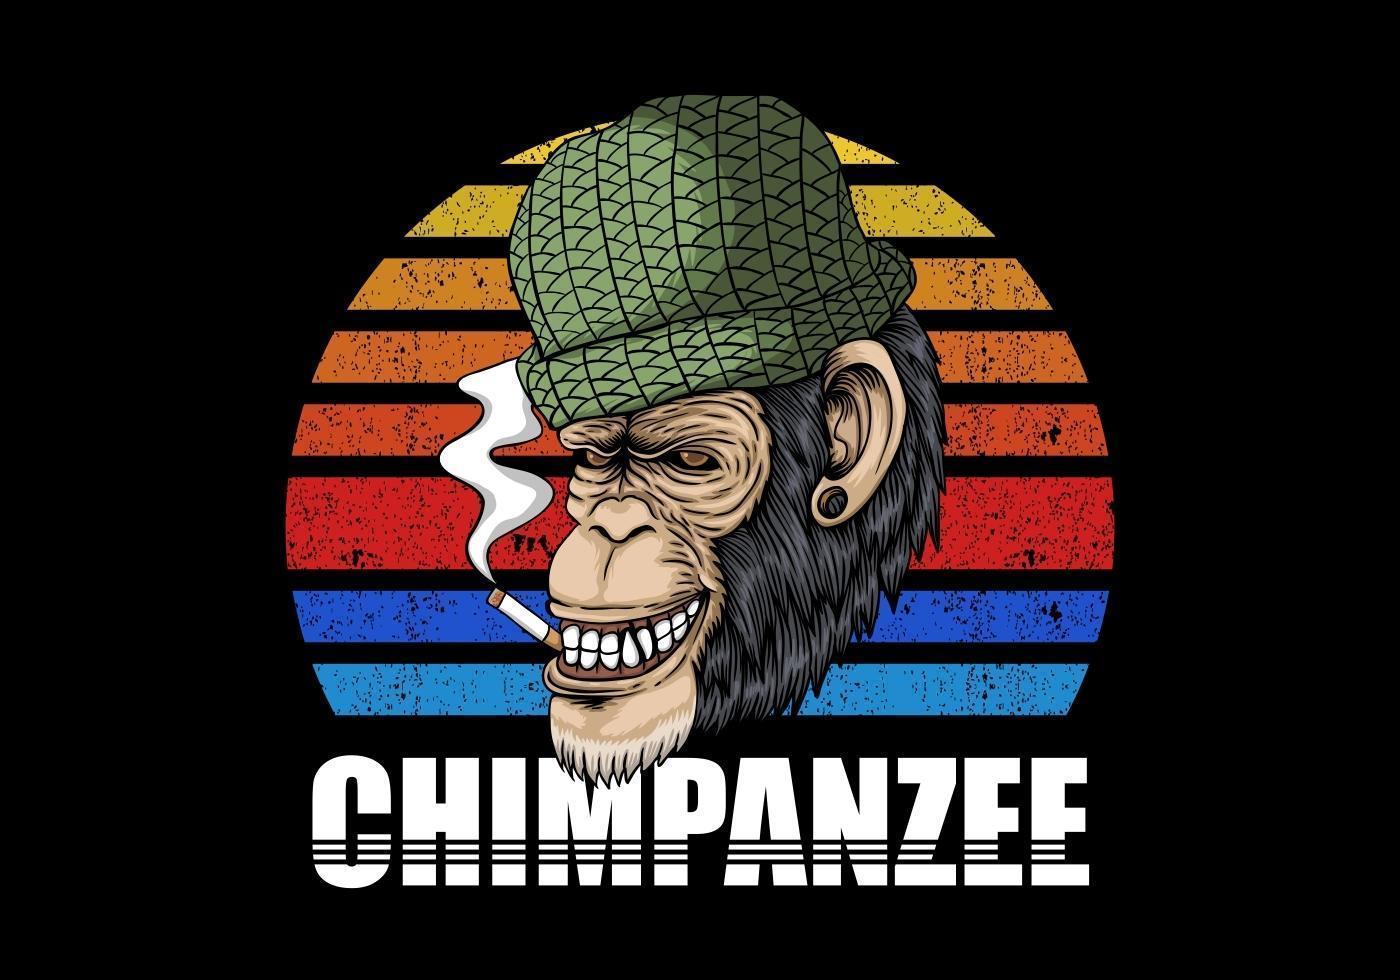 Chimpanzee Smoking Retro Illustration vector